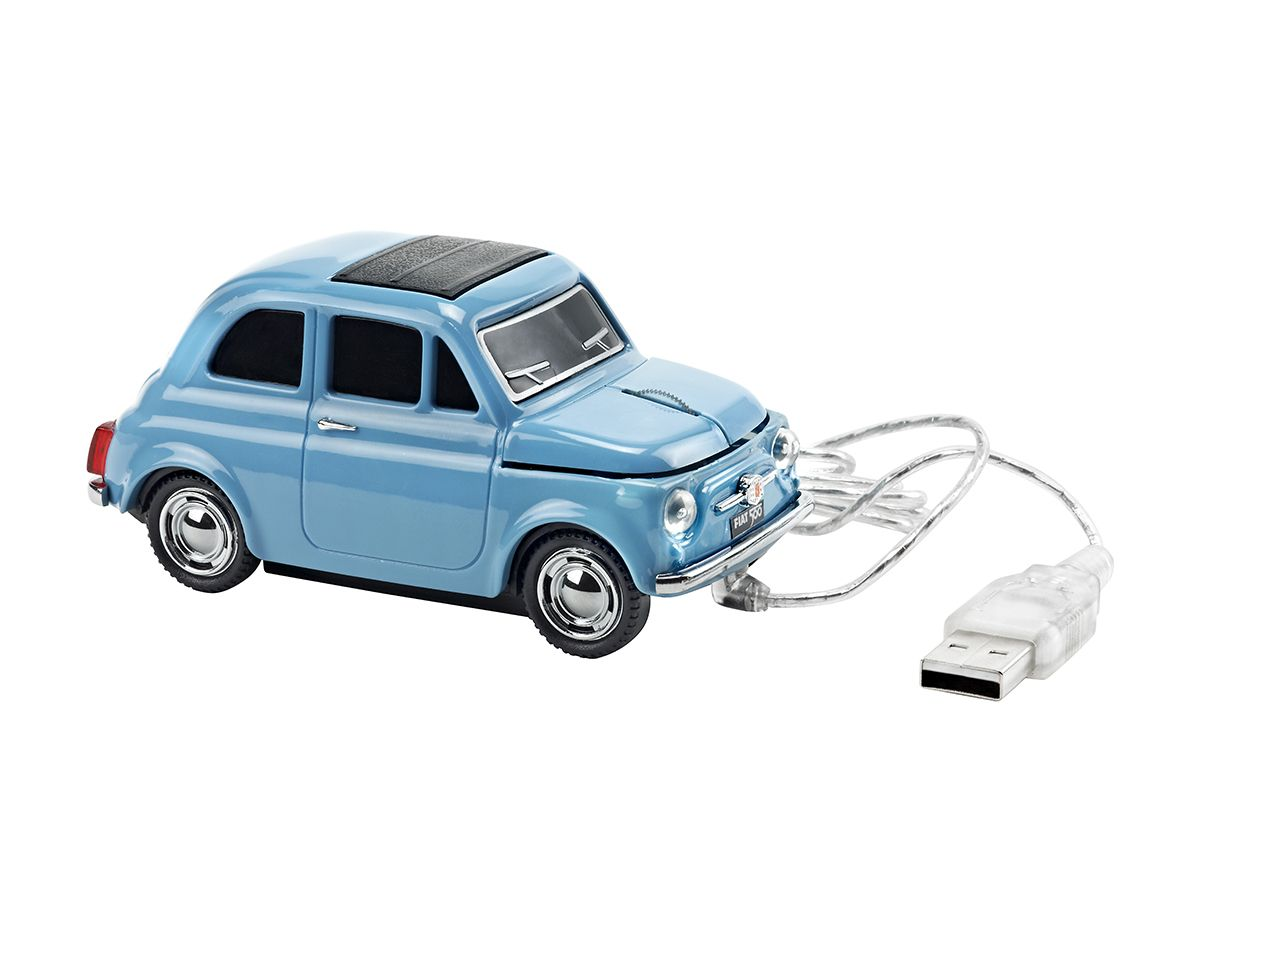 Mopar per Fiat 500 Vintage '57